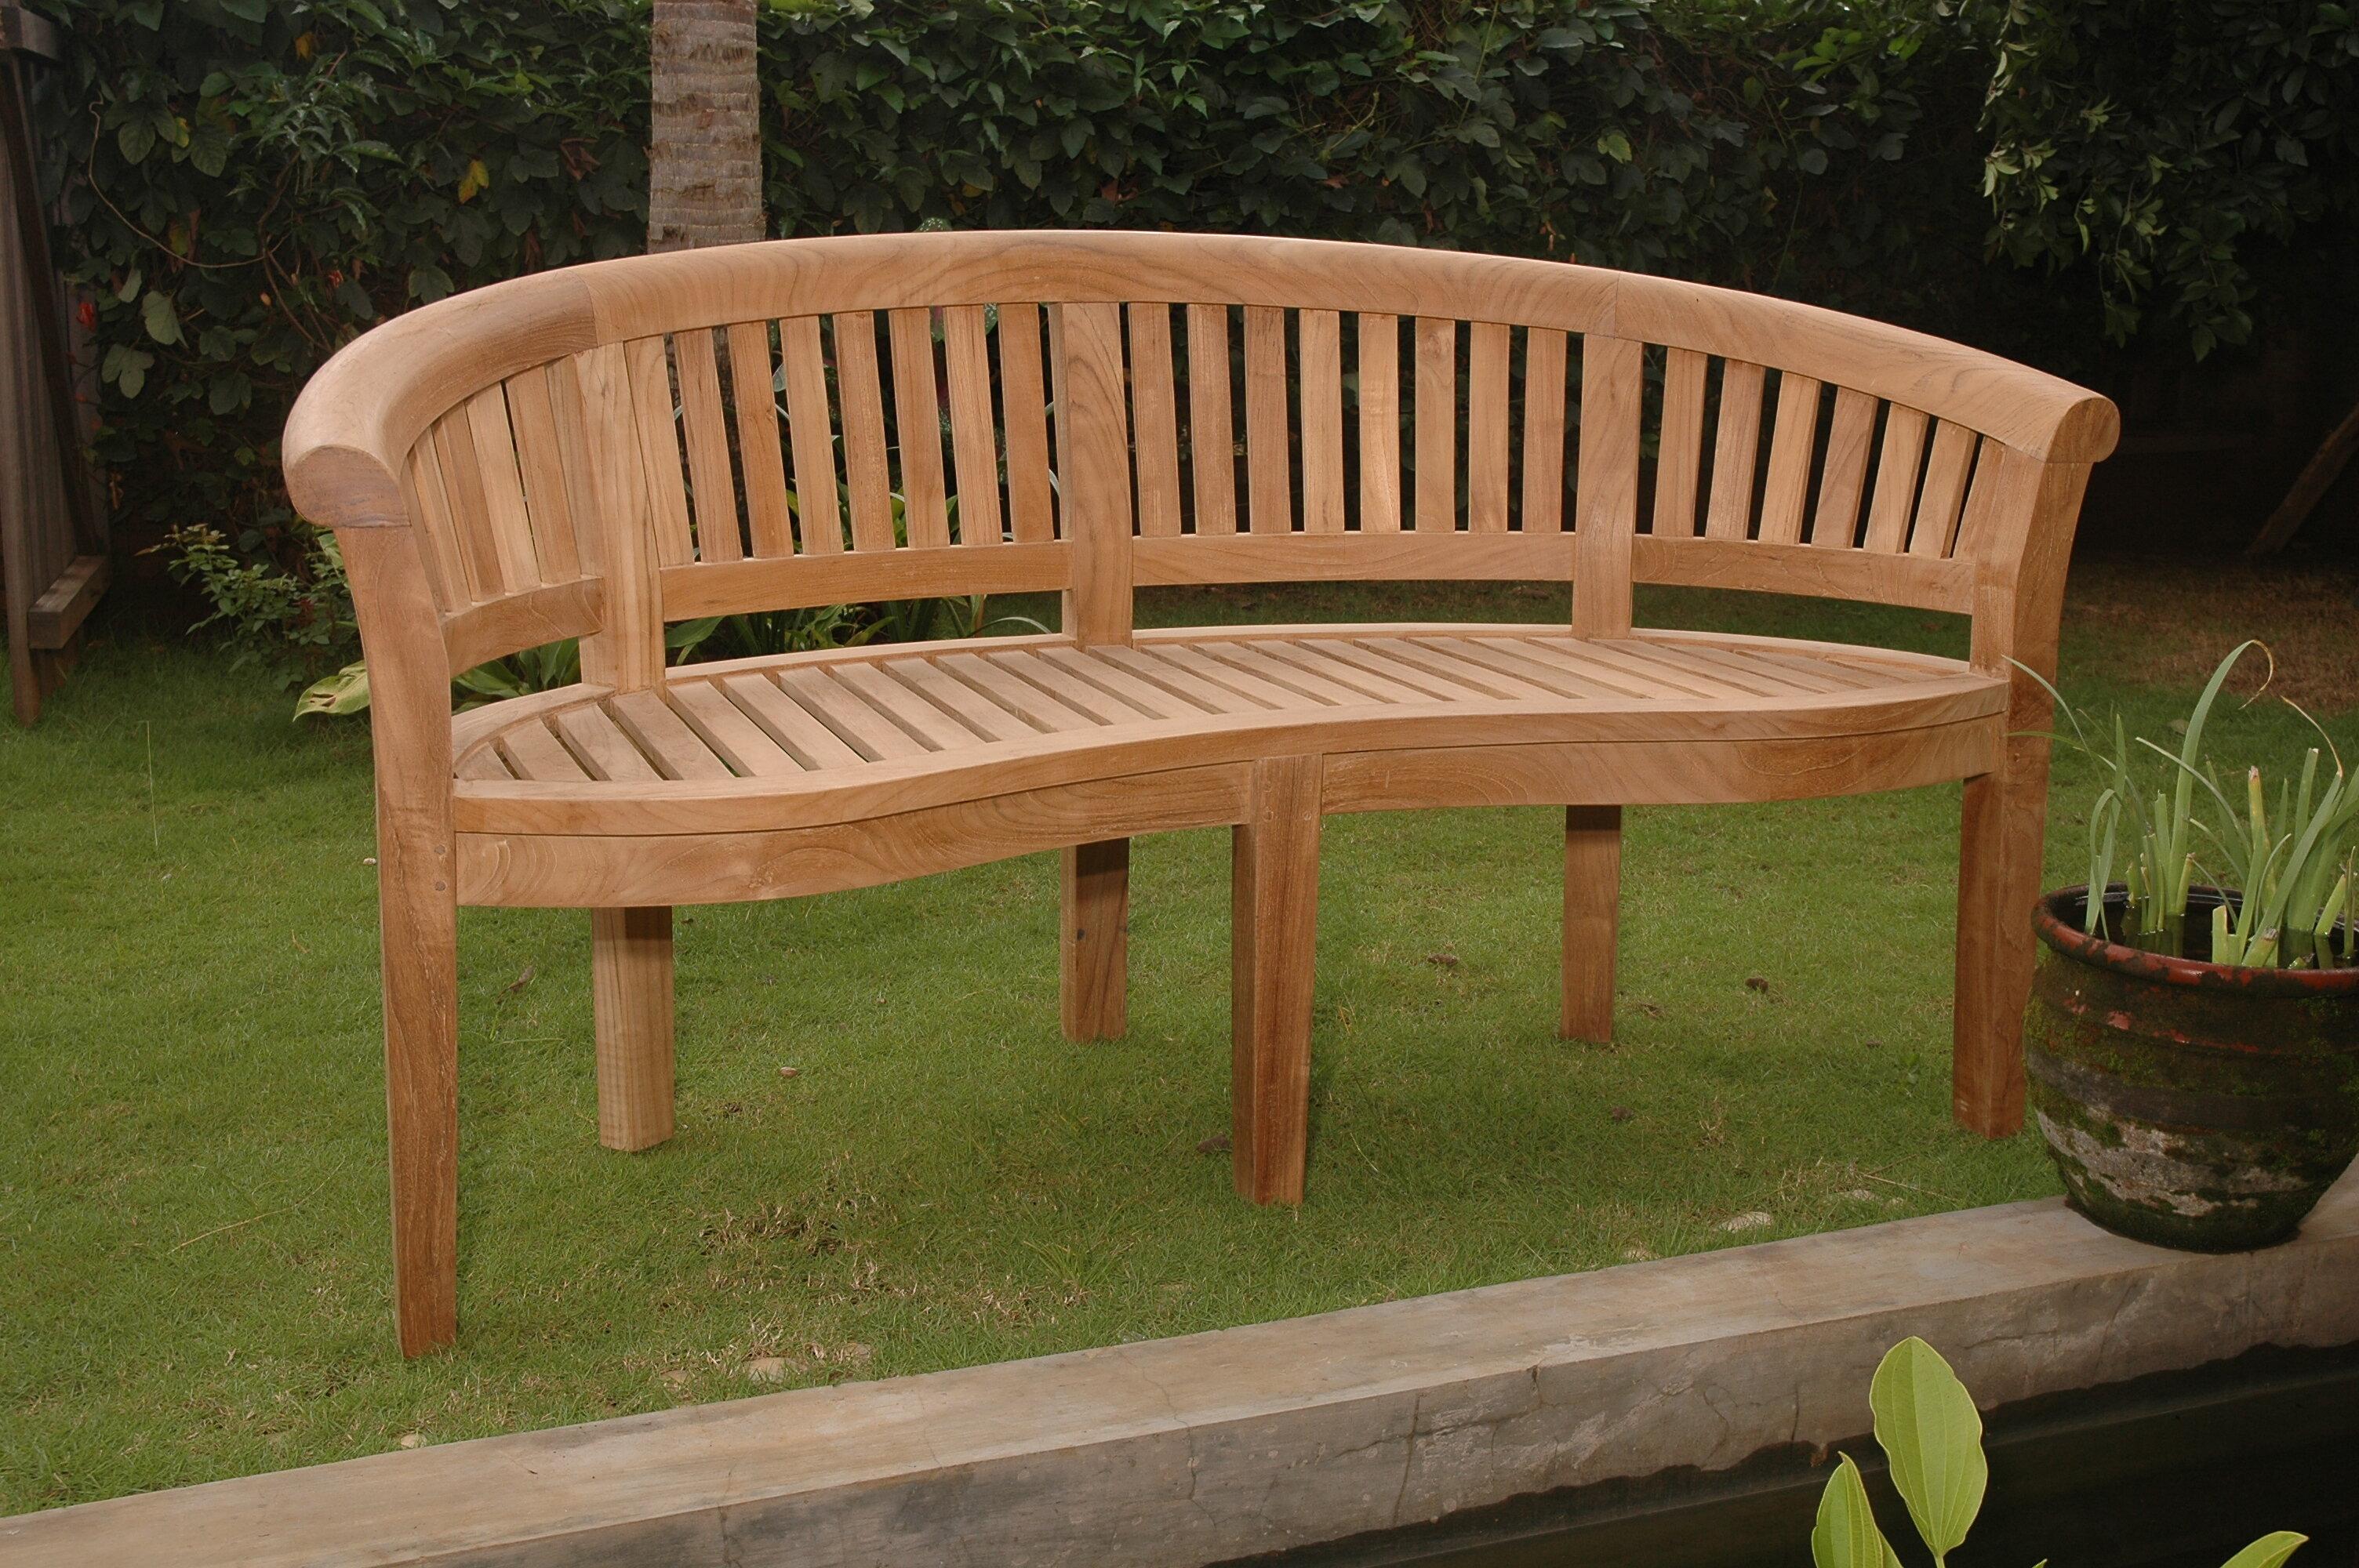 Bourdeau Teak Garden Bench